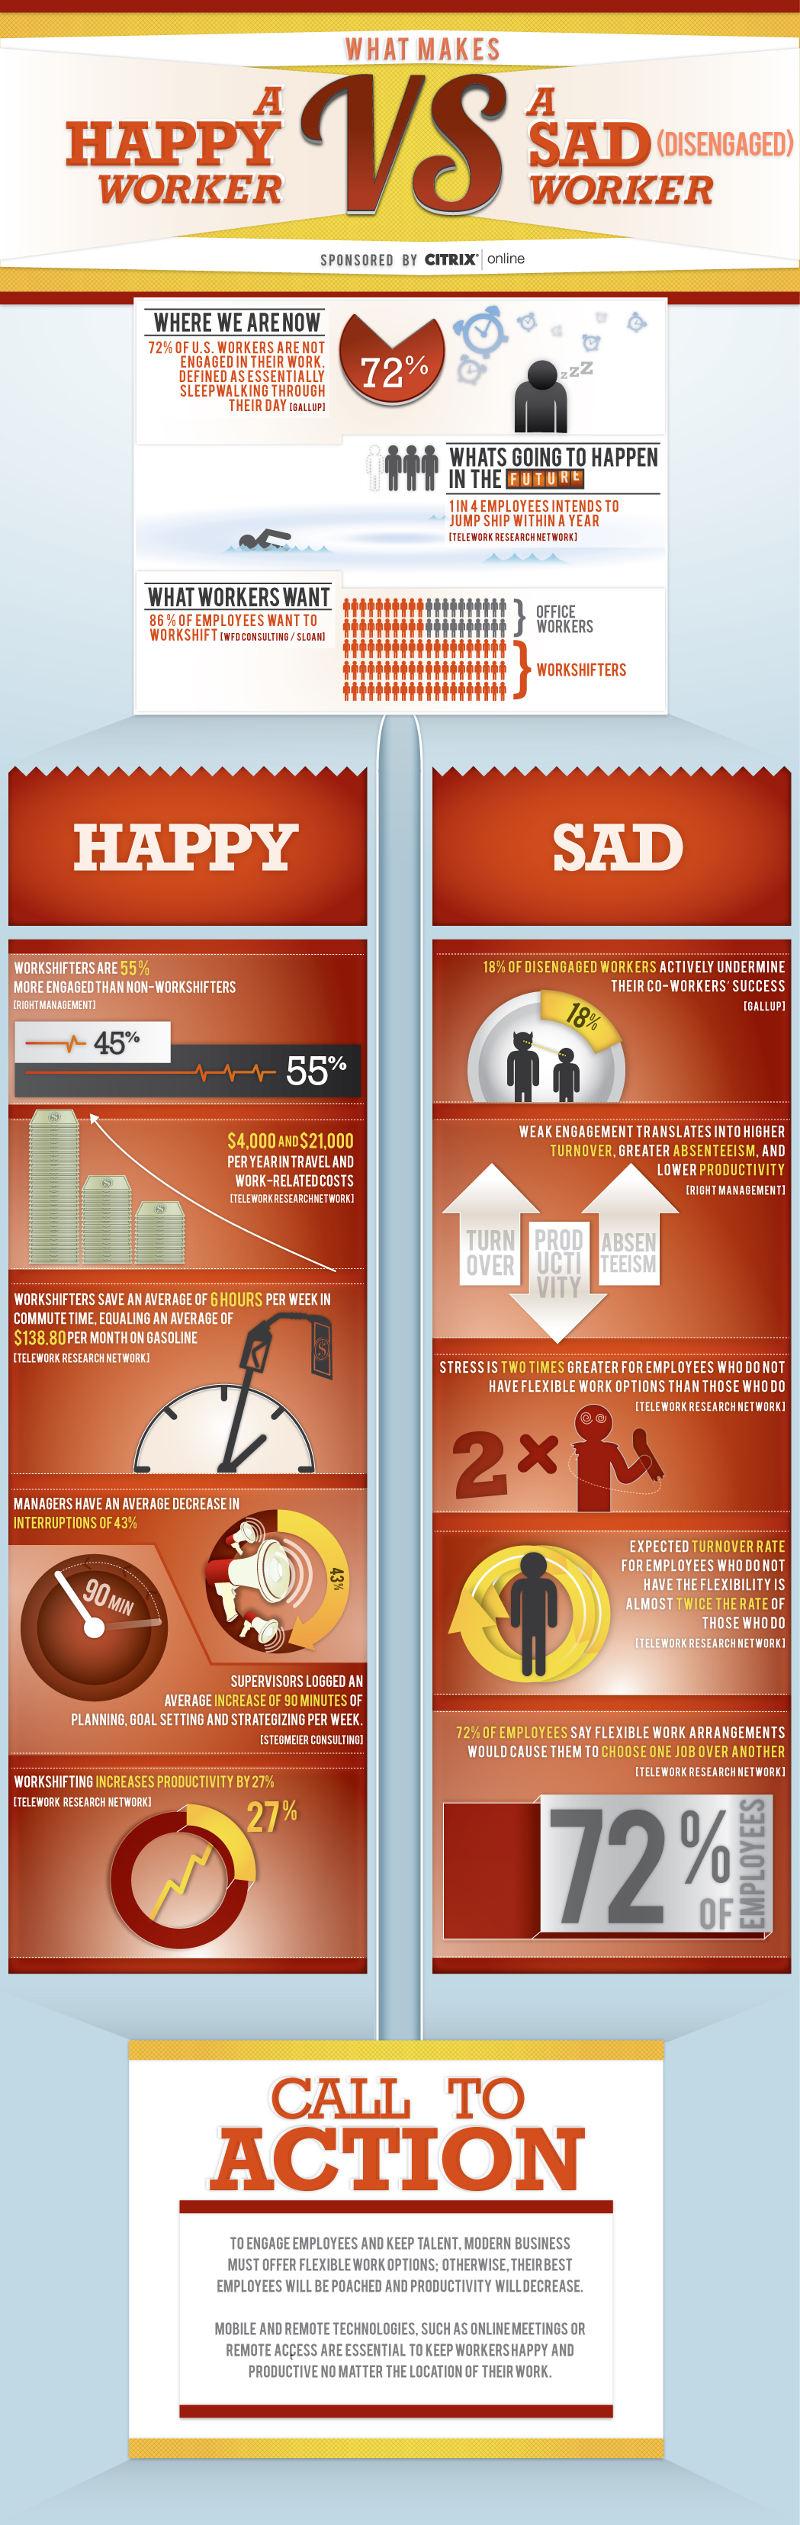 infographie-employe-heureux-vs-employe-malheureux